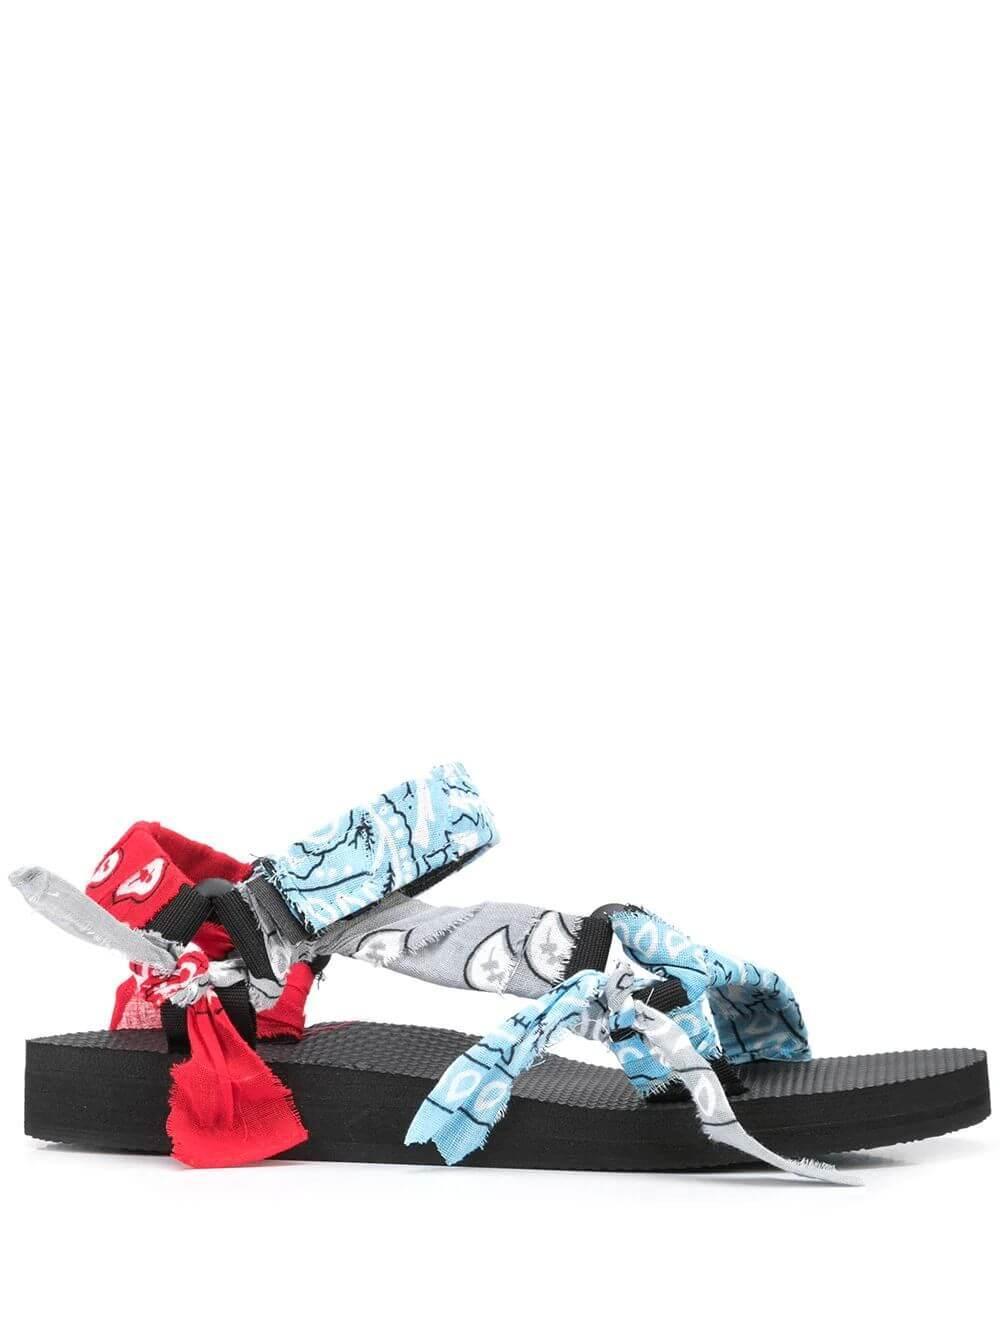 Trekky Bandana Sandal Item # TREKKY BLUE